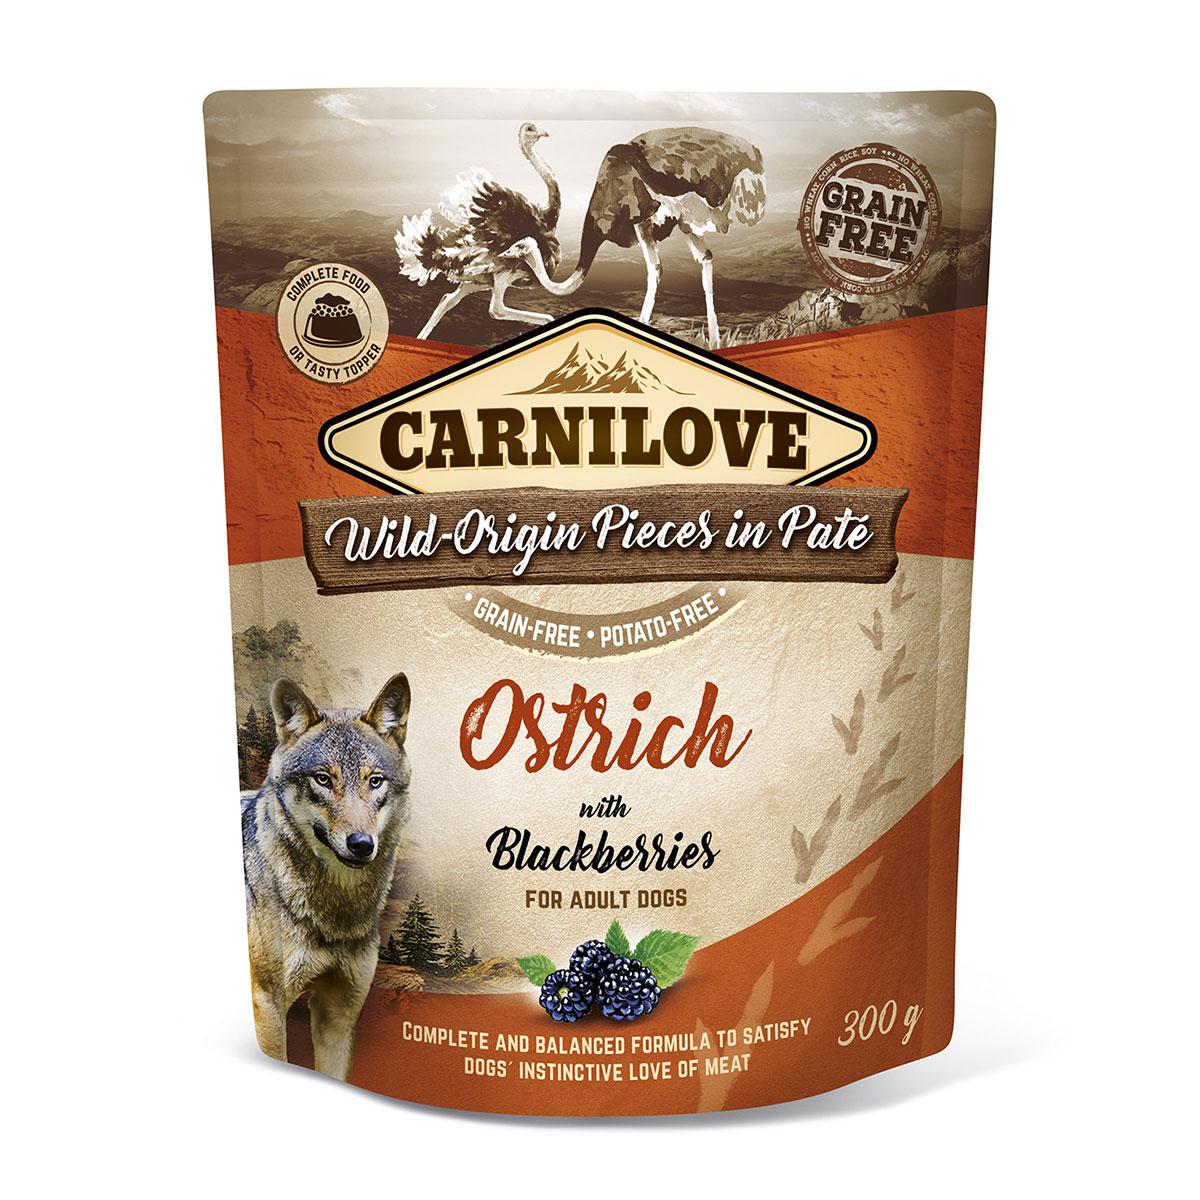 Carnilove Dog Pouch Paté Ostrich with Blackberries 300g 10 + 2 ZDARMA